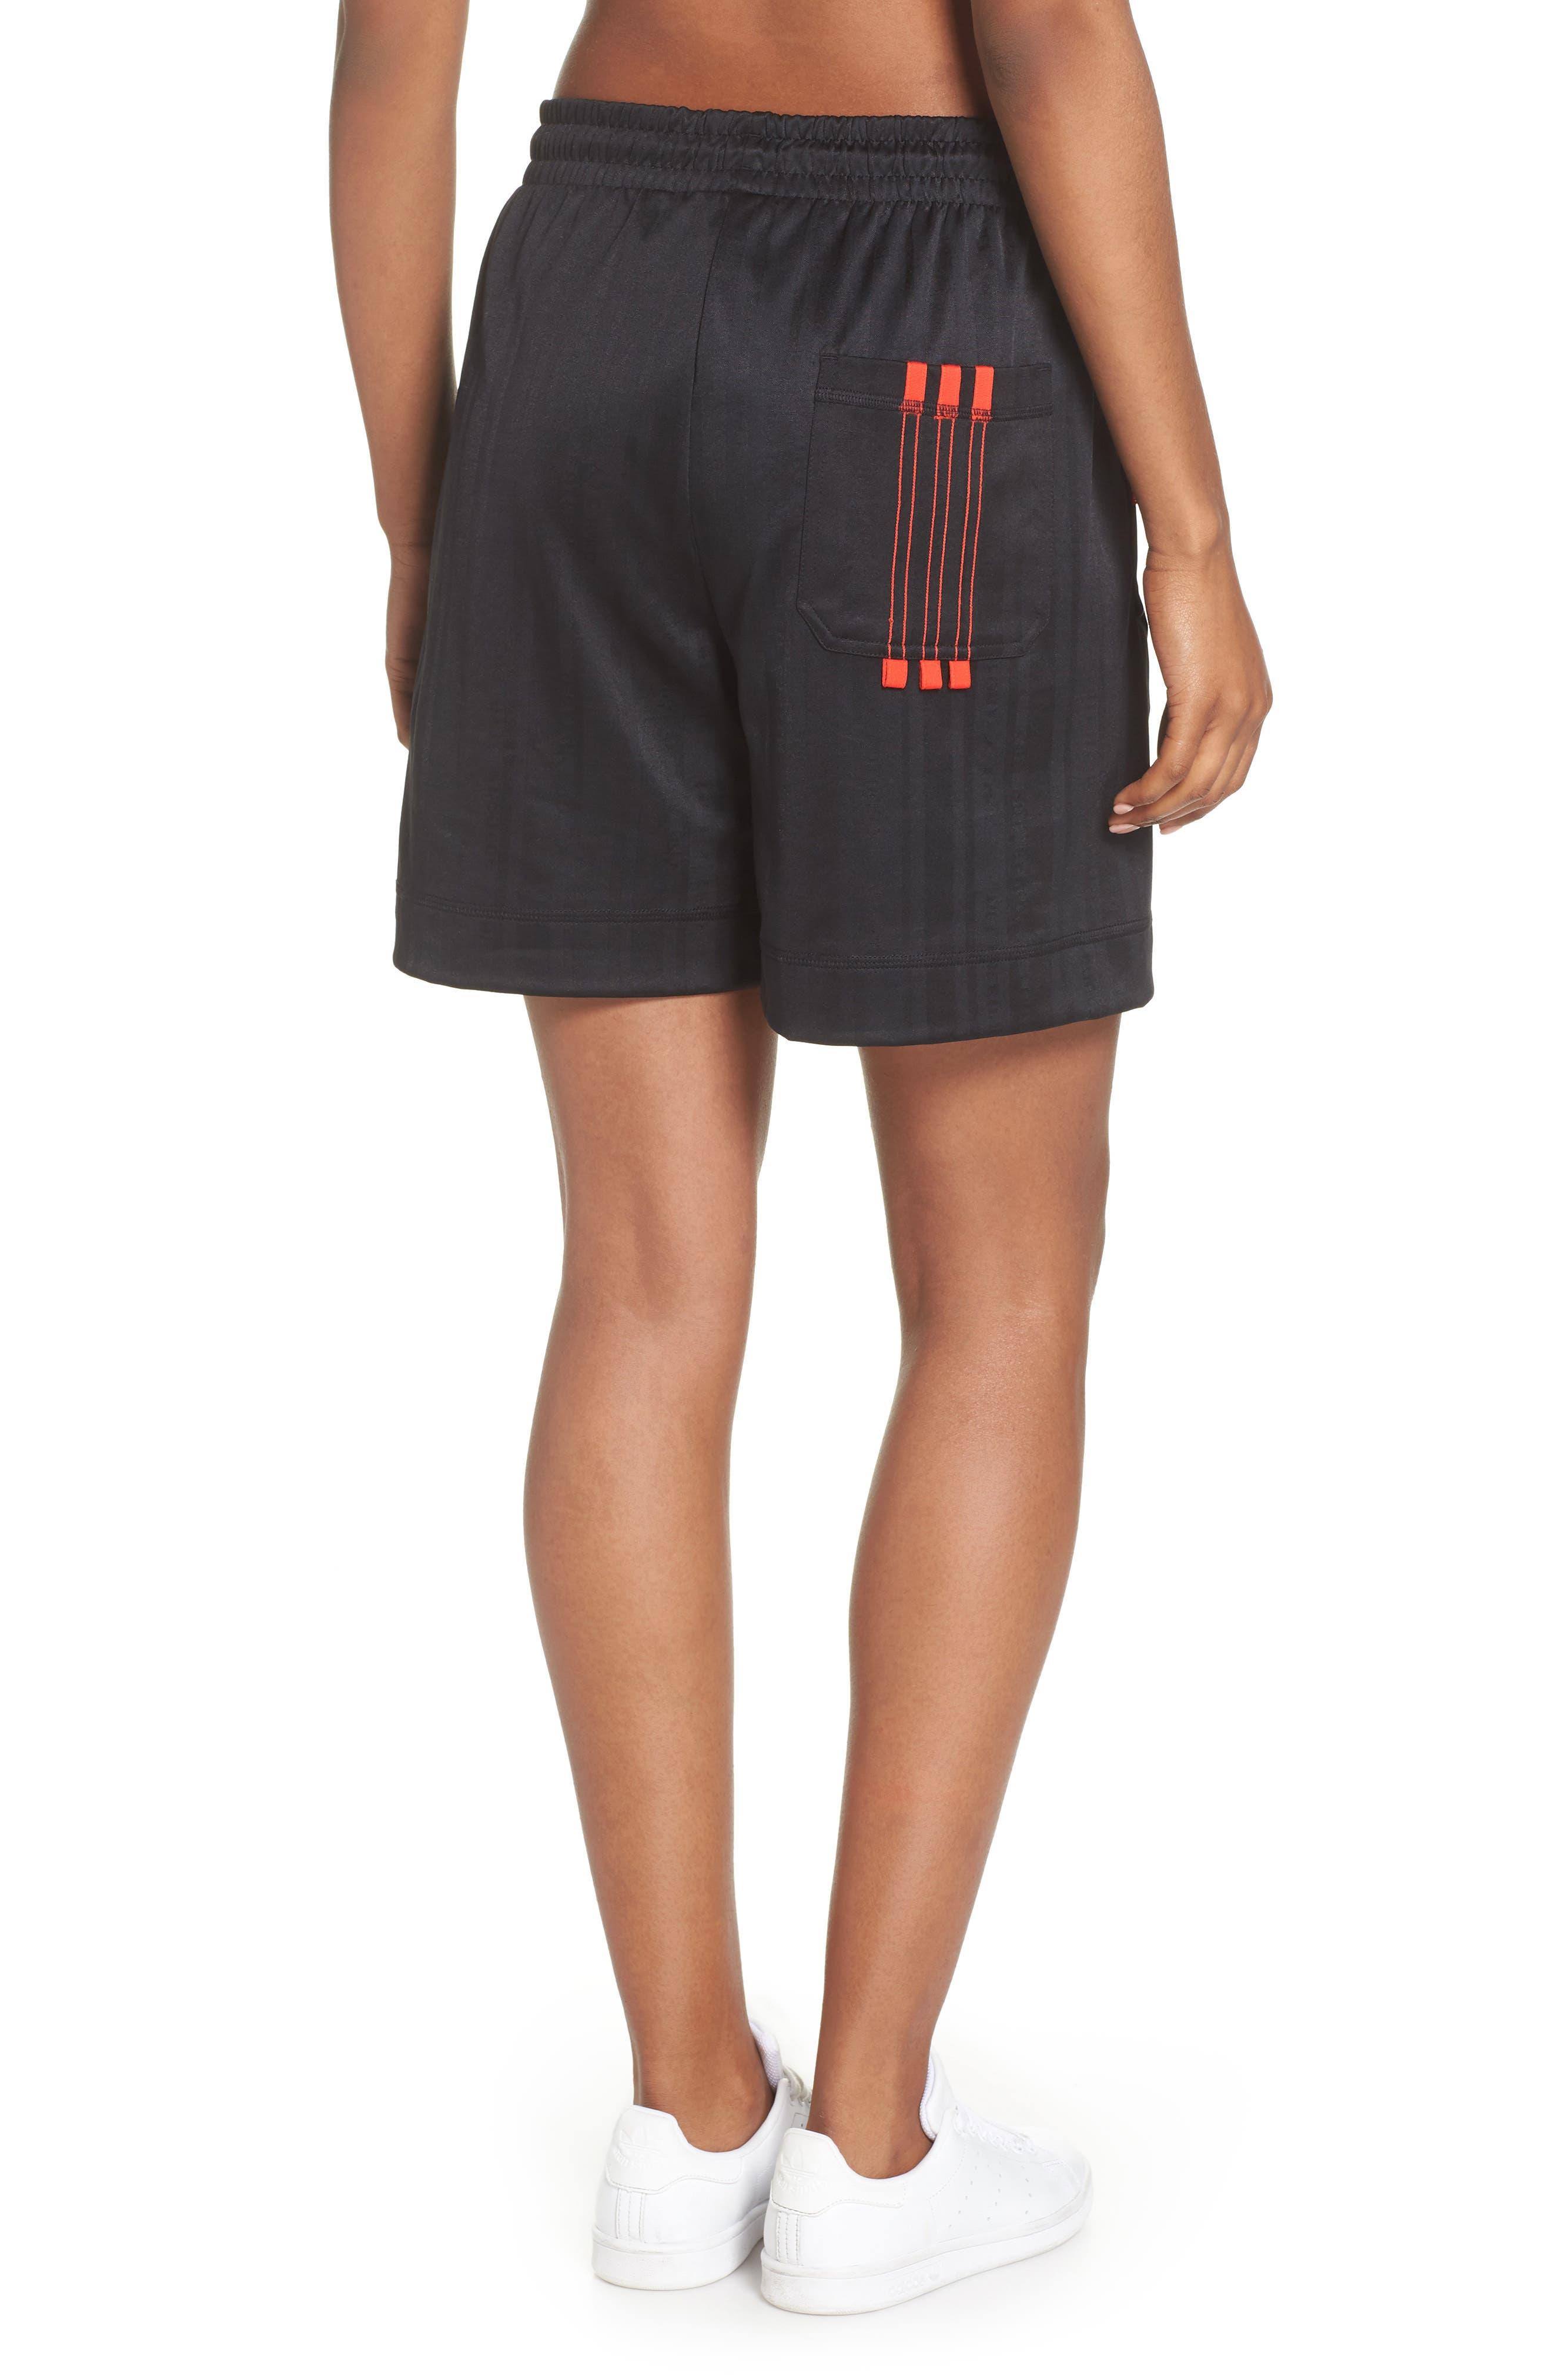 Soccer Shorts,                             Alternate thumbnail 2, color,                             BLACK/ CORE RED